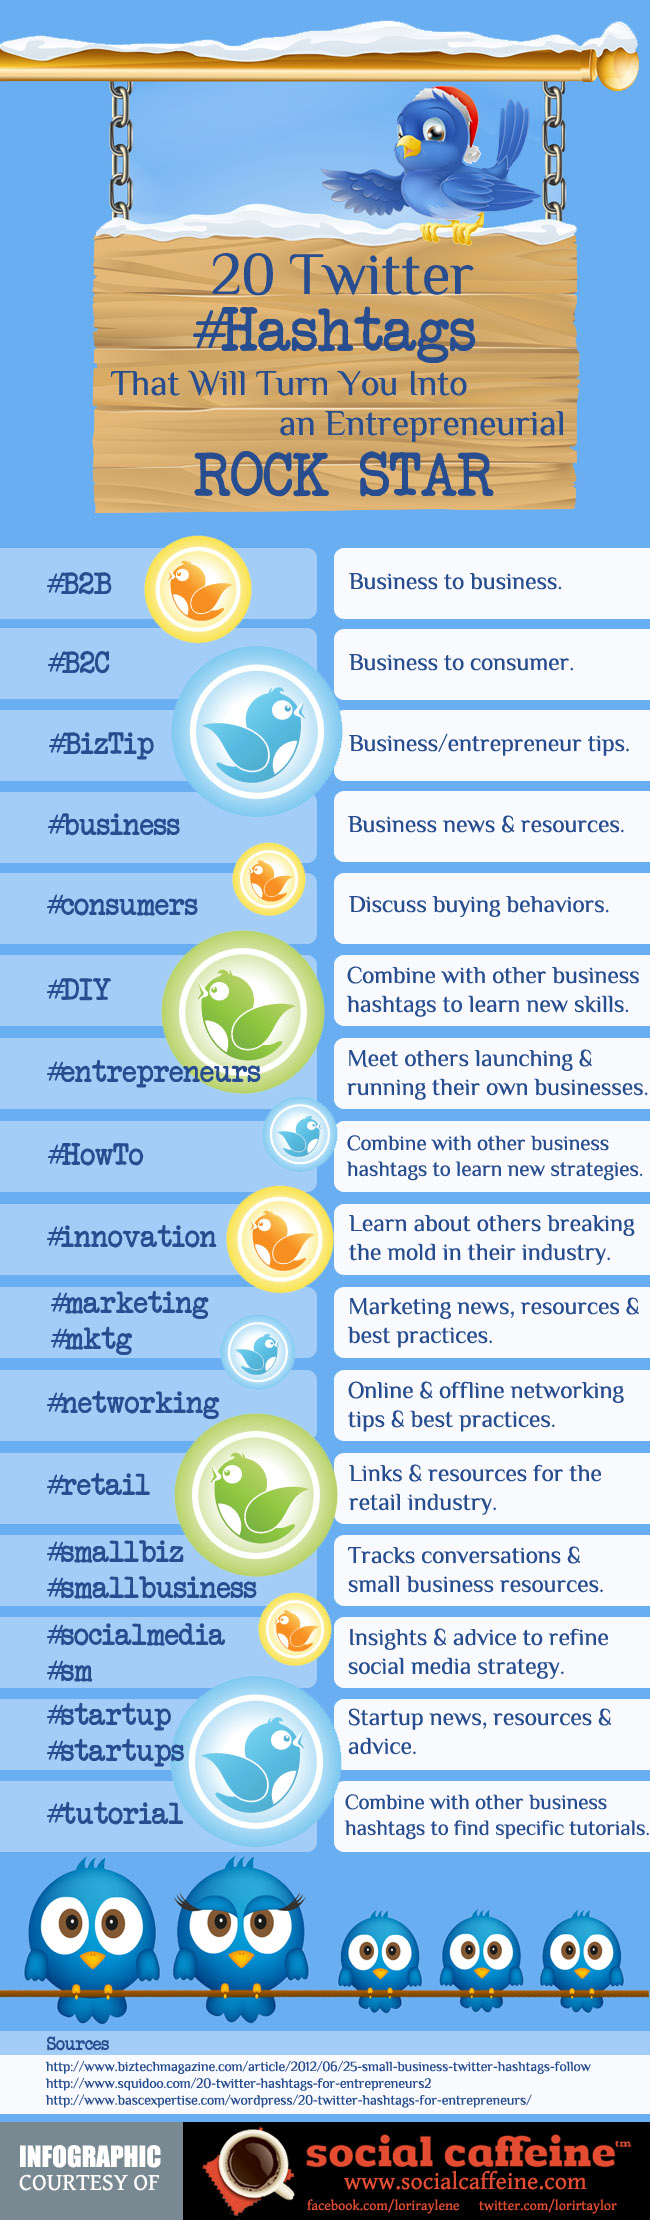 20-entrepreneurial-twitter-hashtags-infographic